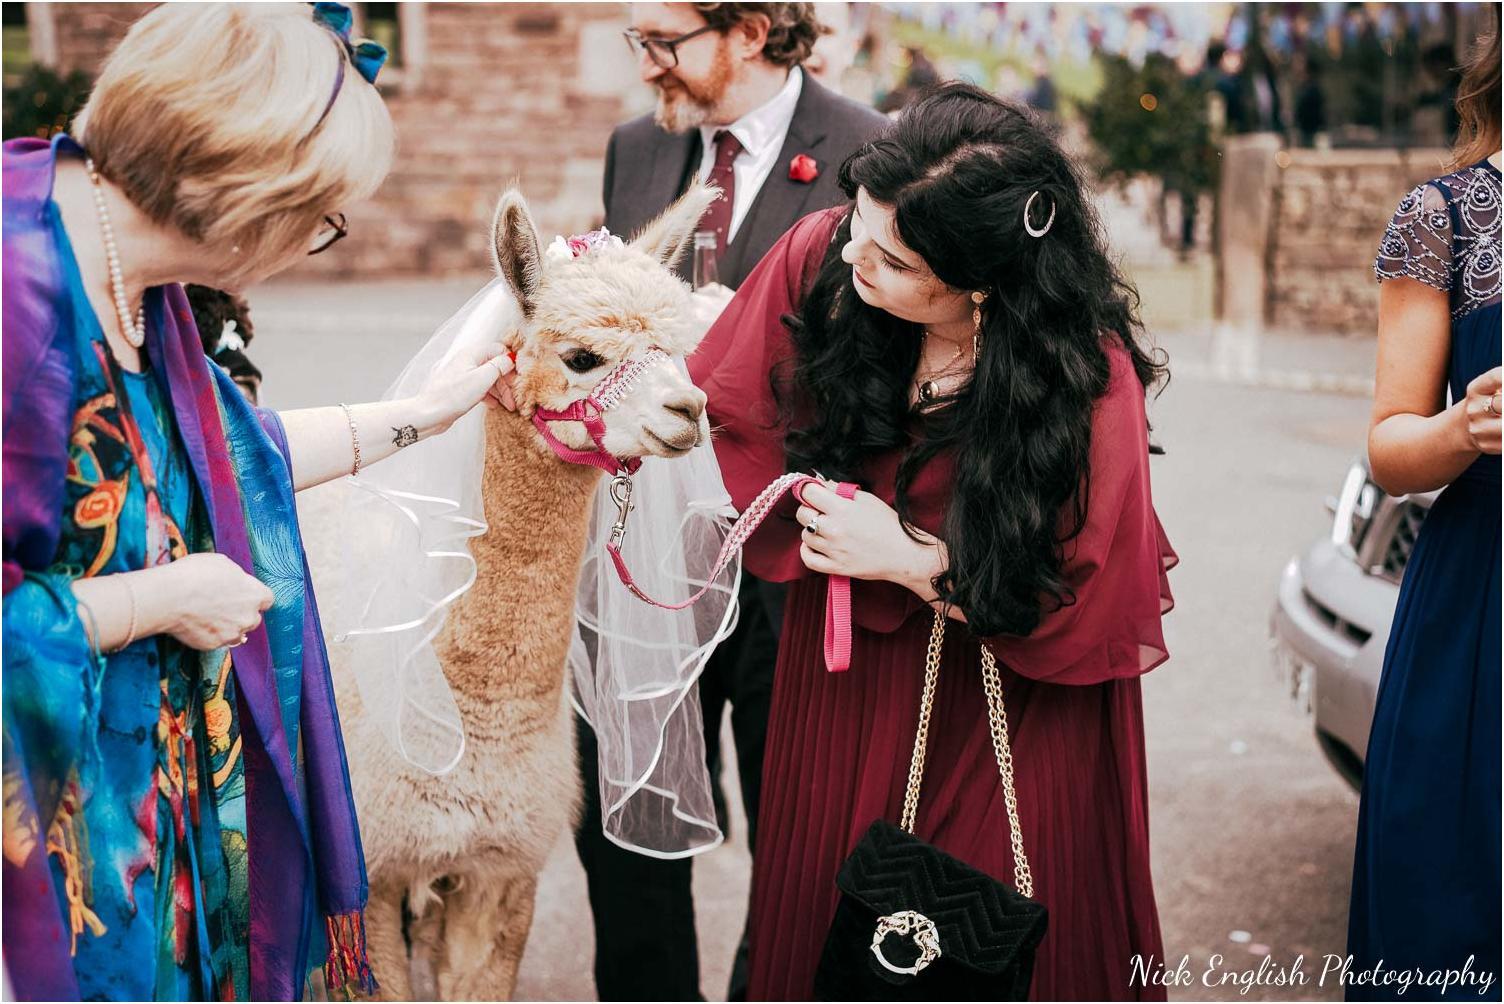 The_Ashes_Barn_Endon_Stoke_Wedding_Photographer-62.jpg